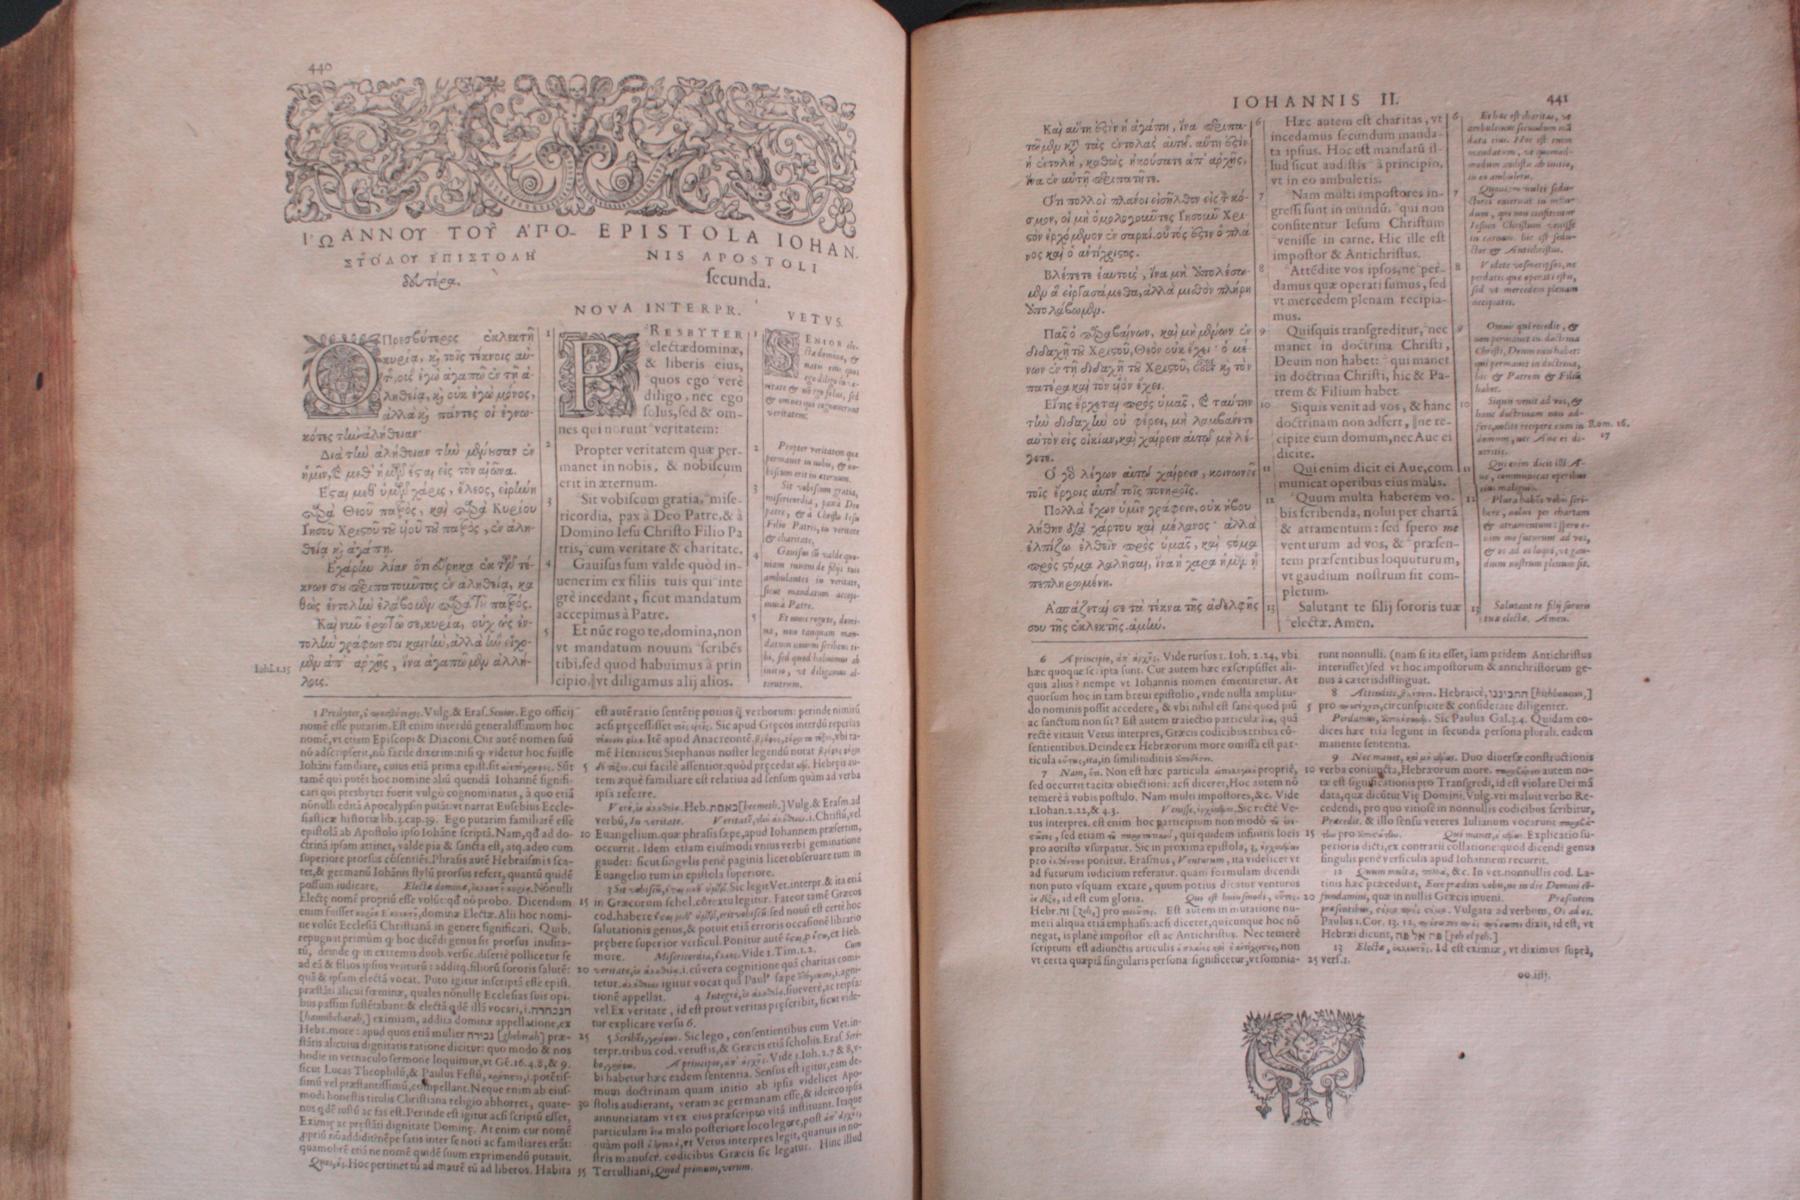 Griechische-Lateinische Bibel, Novum Testamentum 1582-18